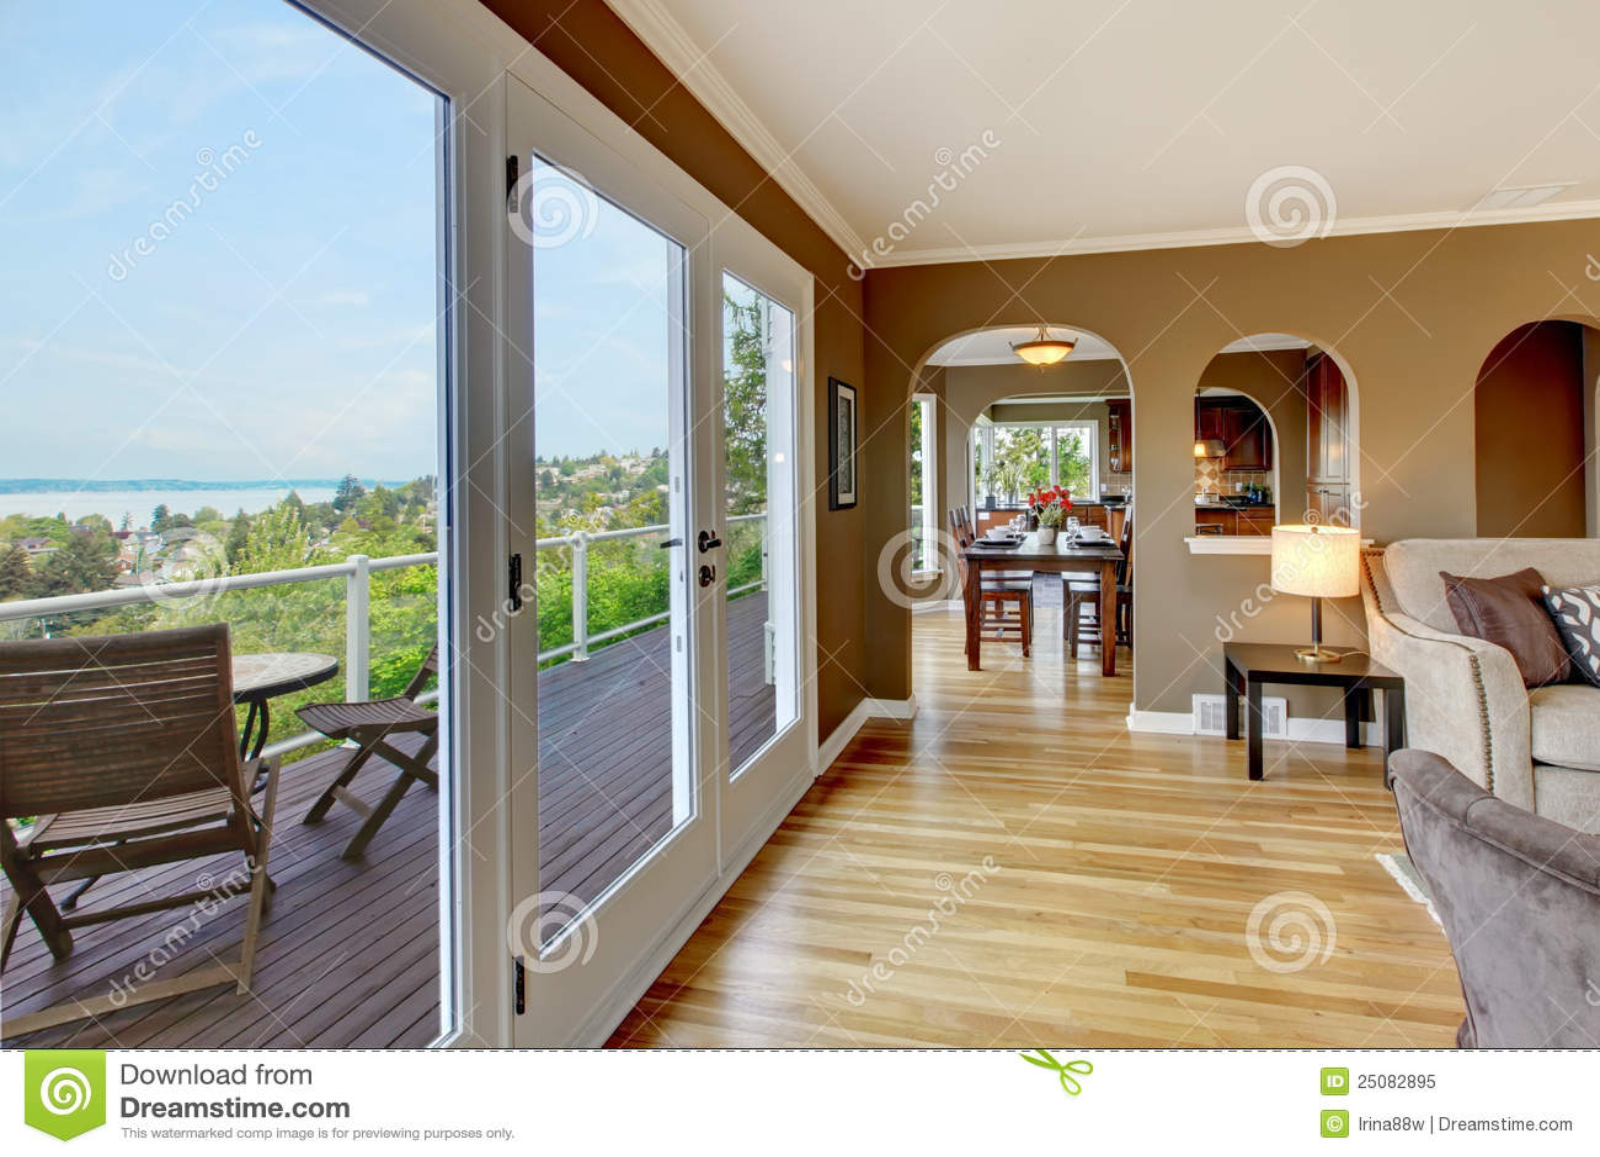 Luxury Brown Living Room With Hardwood Floors Stock Image Image 25082895